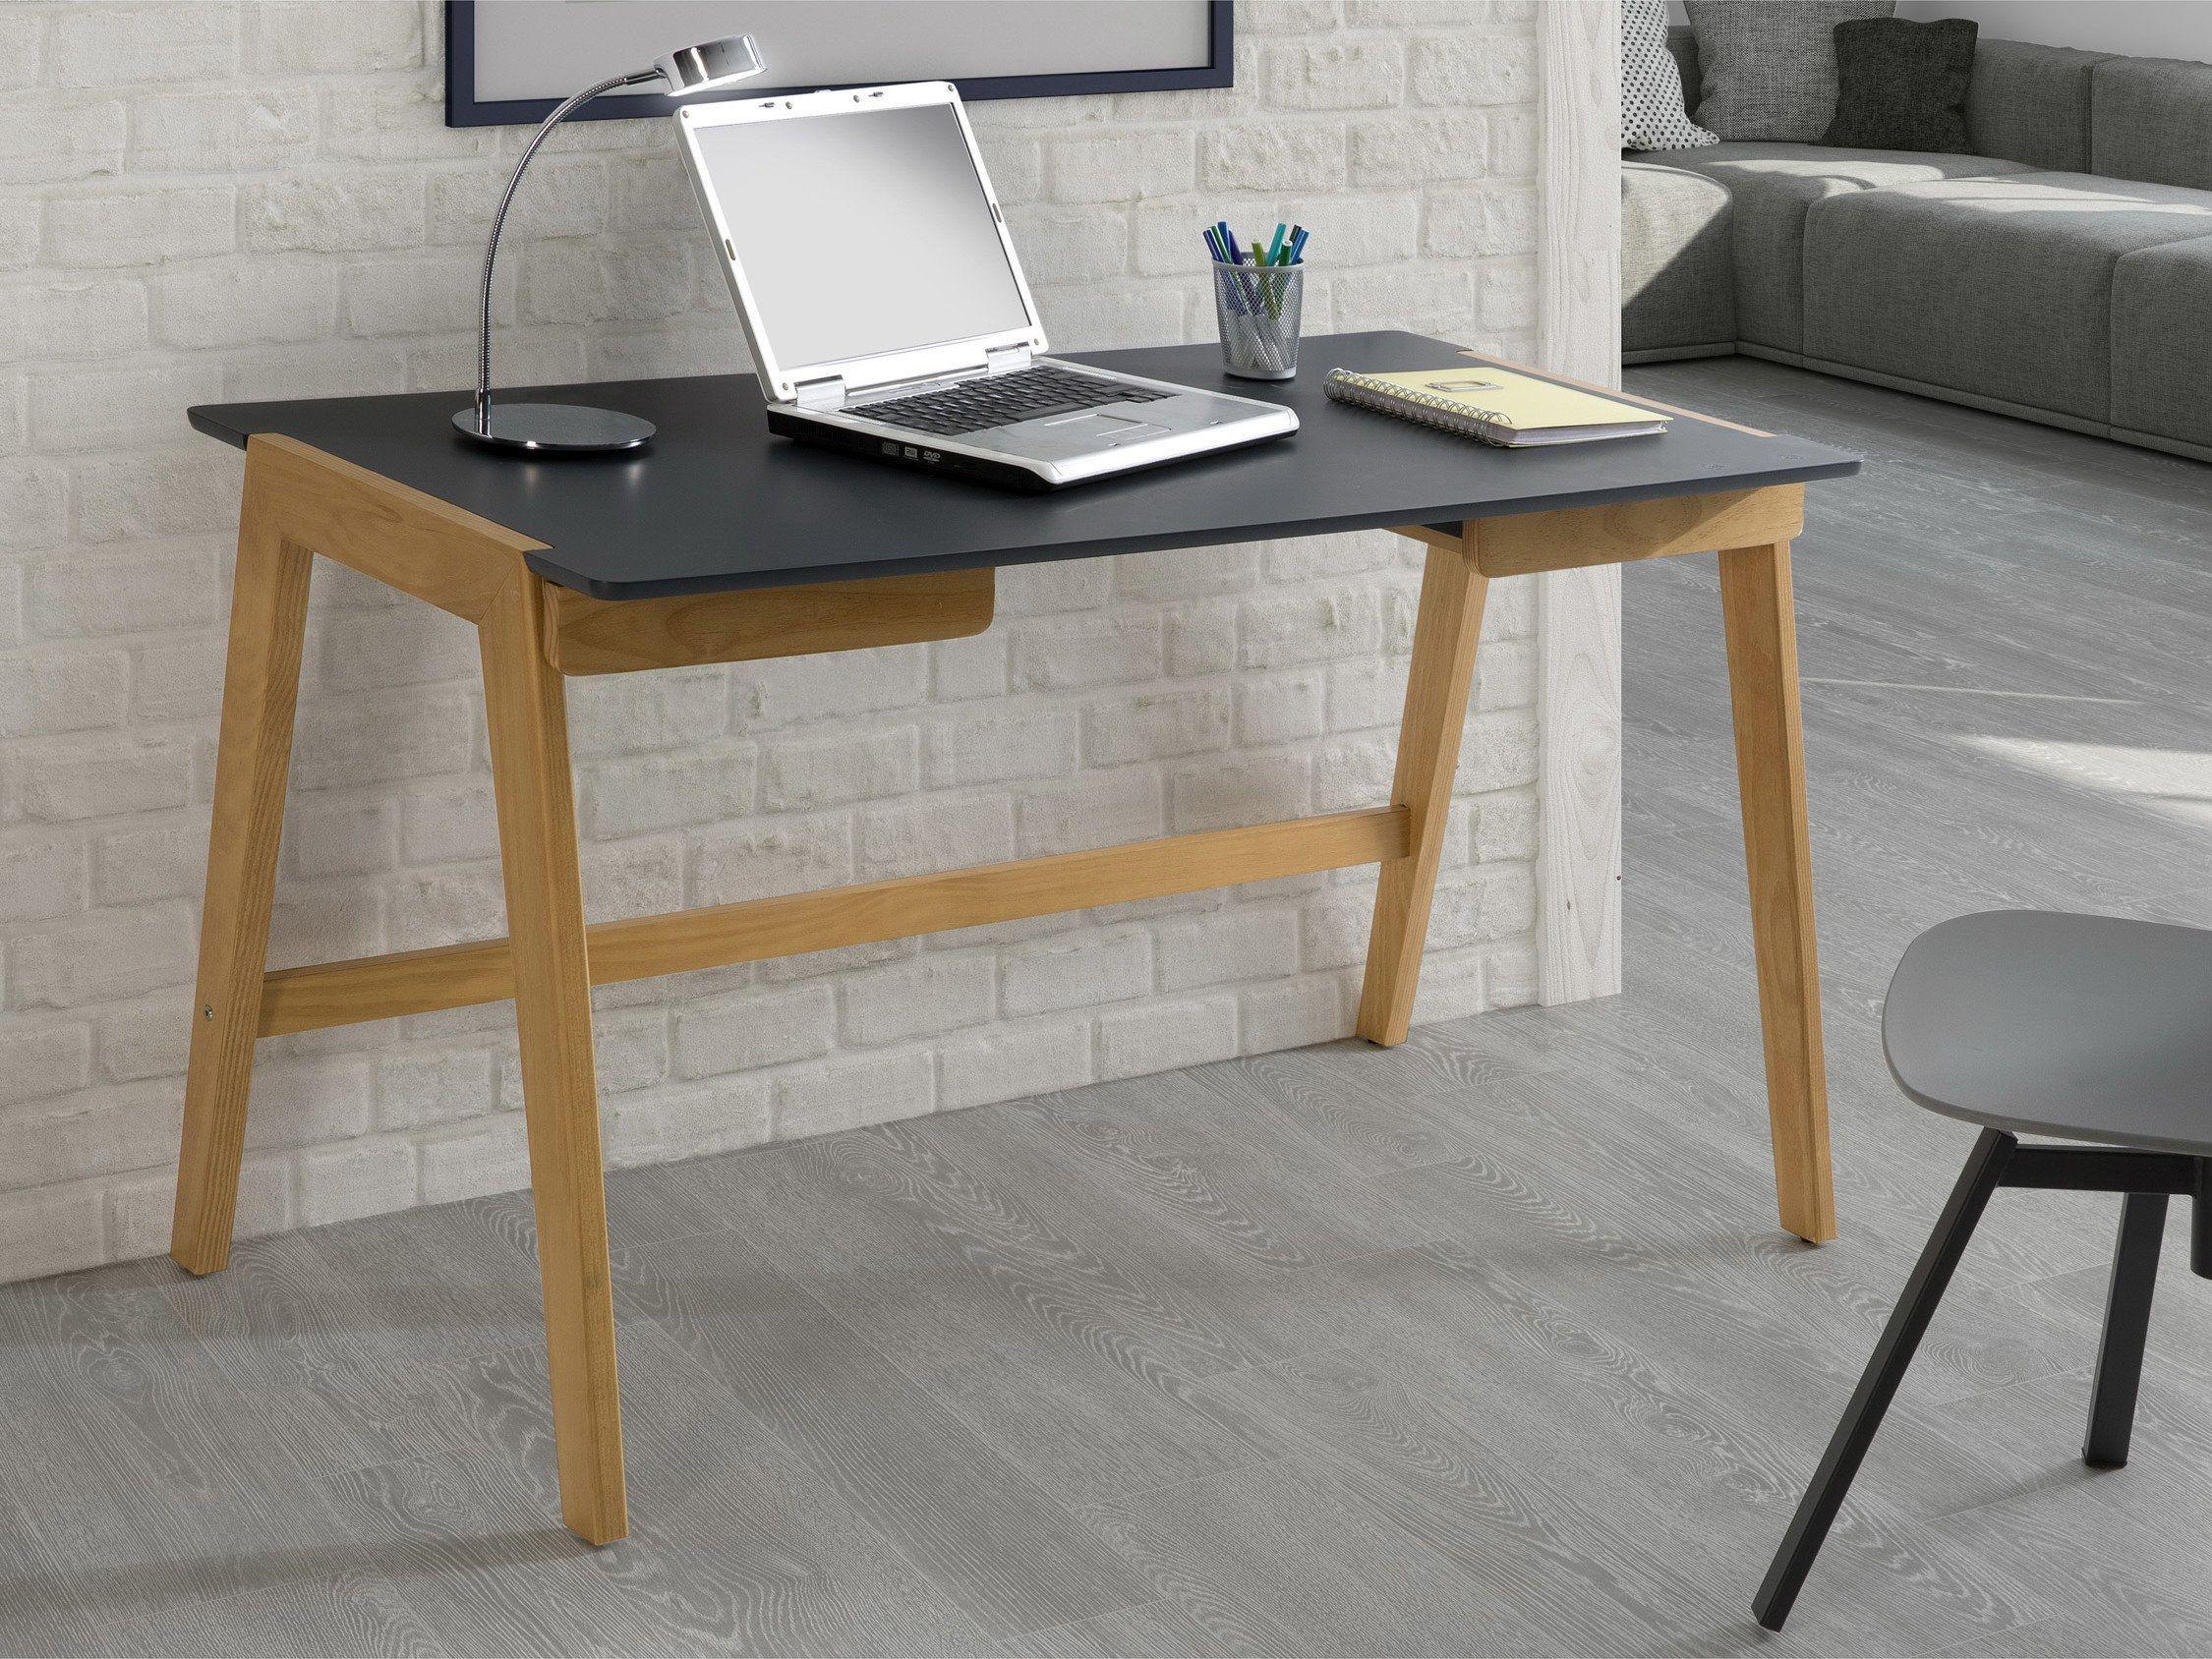 Mbu3292074 0403 2250 P02 Bureau Bois Avec Tiroirs Pietement Massif Longueur 120 Savea Jpg 2250 1688 Furniture Home Decor Desk